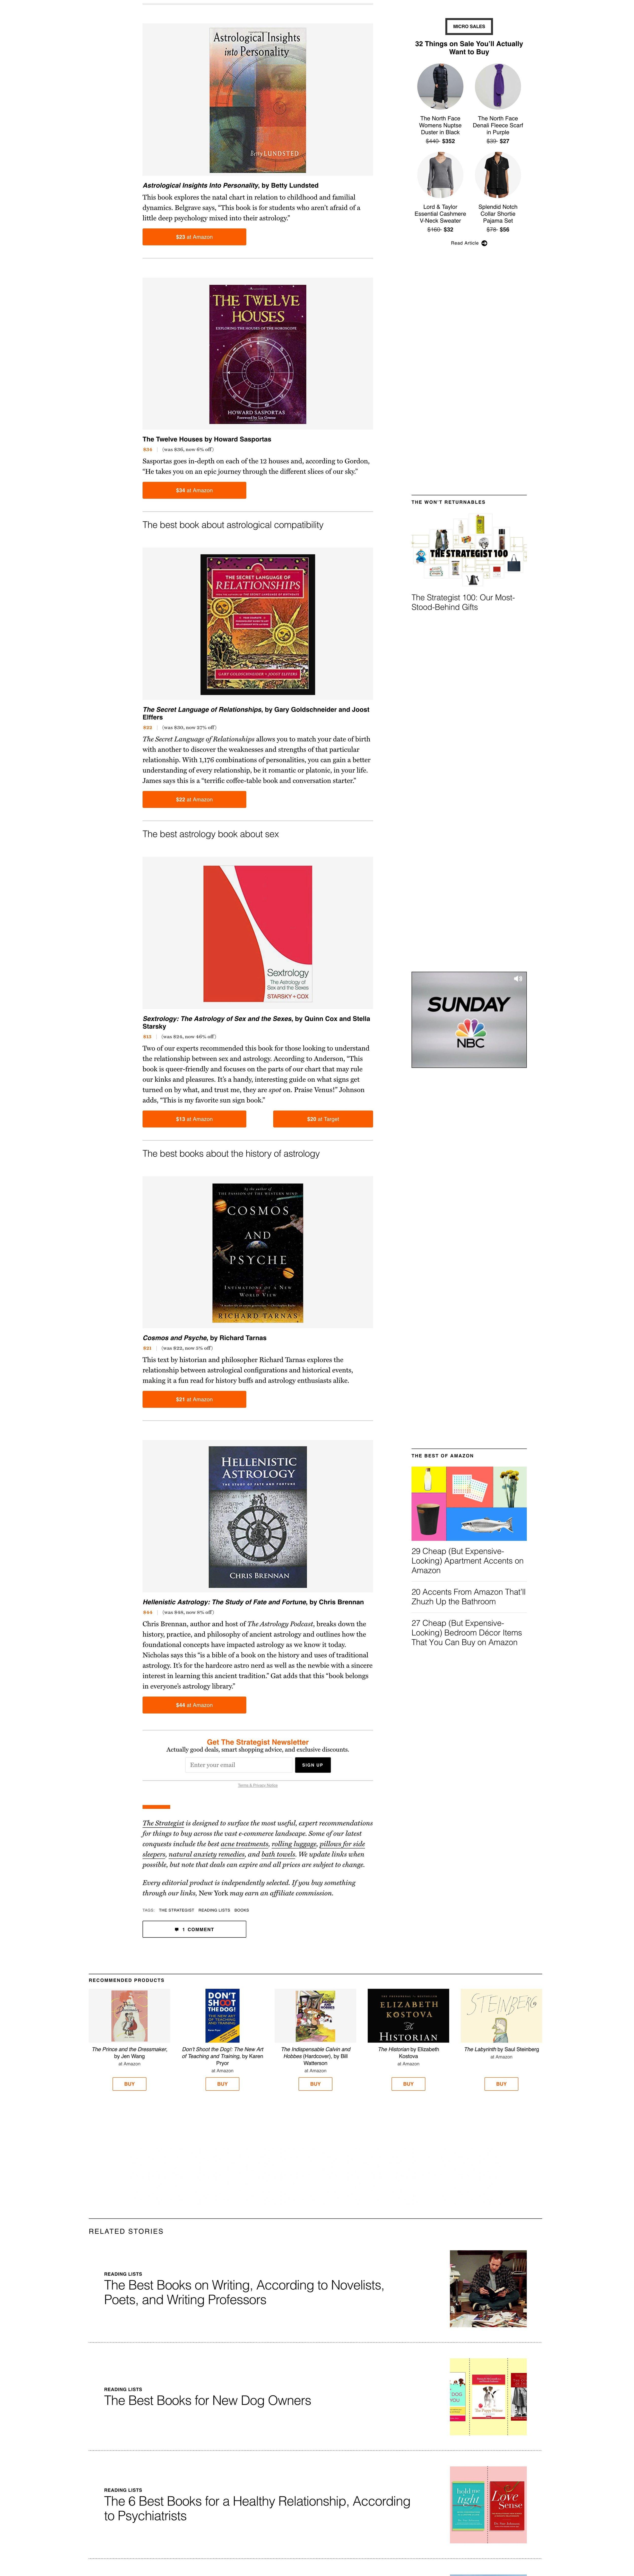 screencapture-nymag-strategist-article-best-books-astrology-html-2019-03-01-12_09_54.jpg